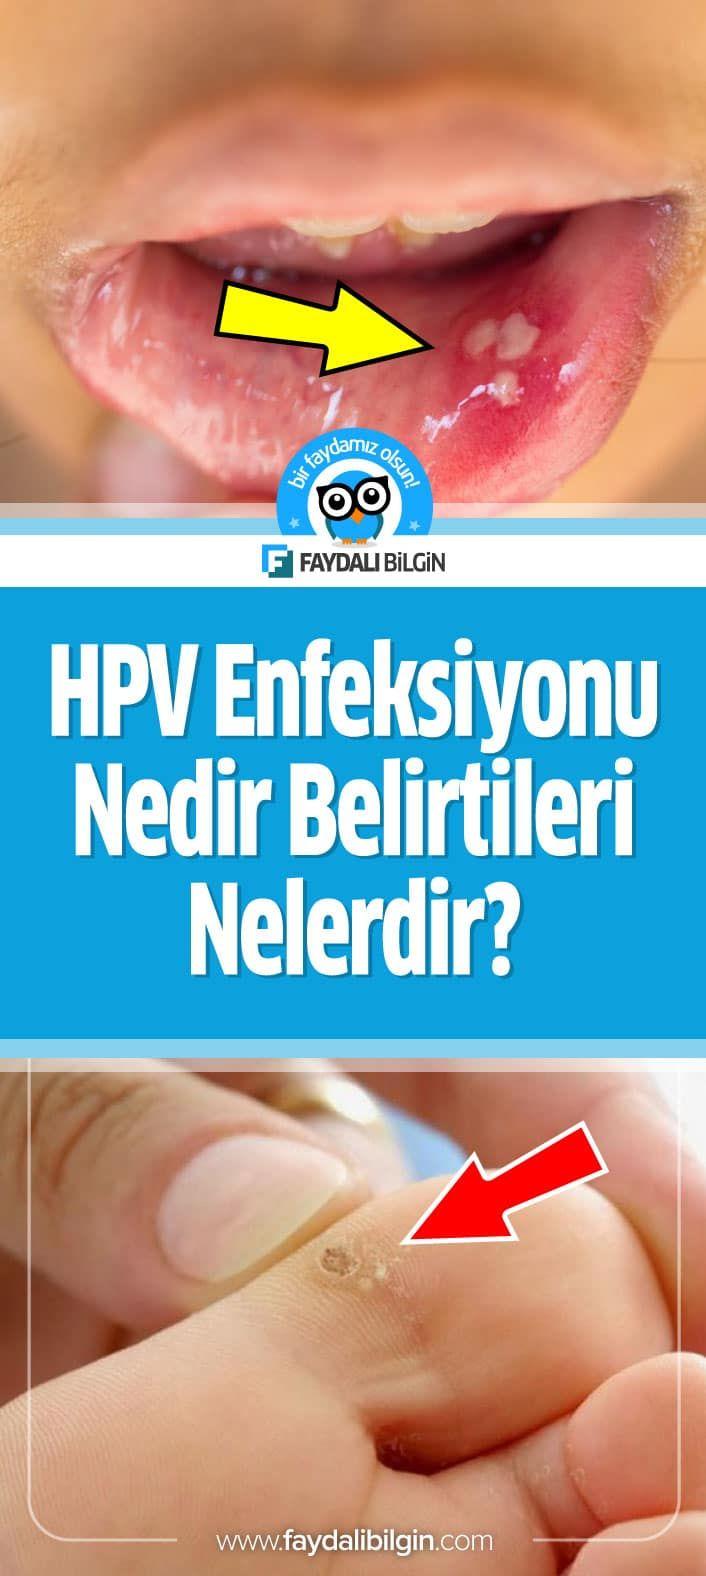 Hpv virusu nedir tedavisi. Photos and Videos about #microscop